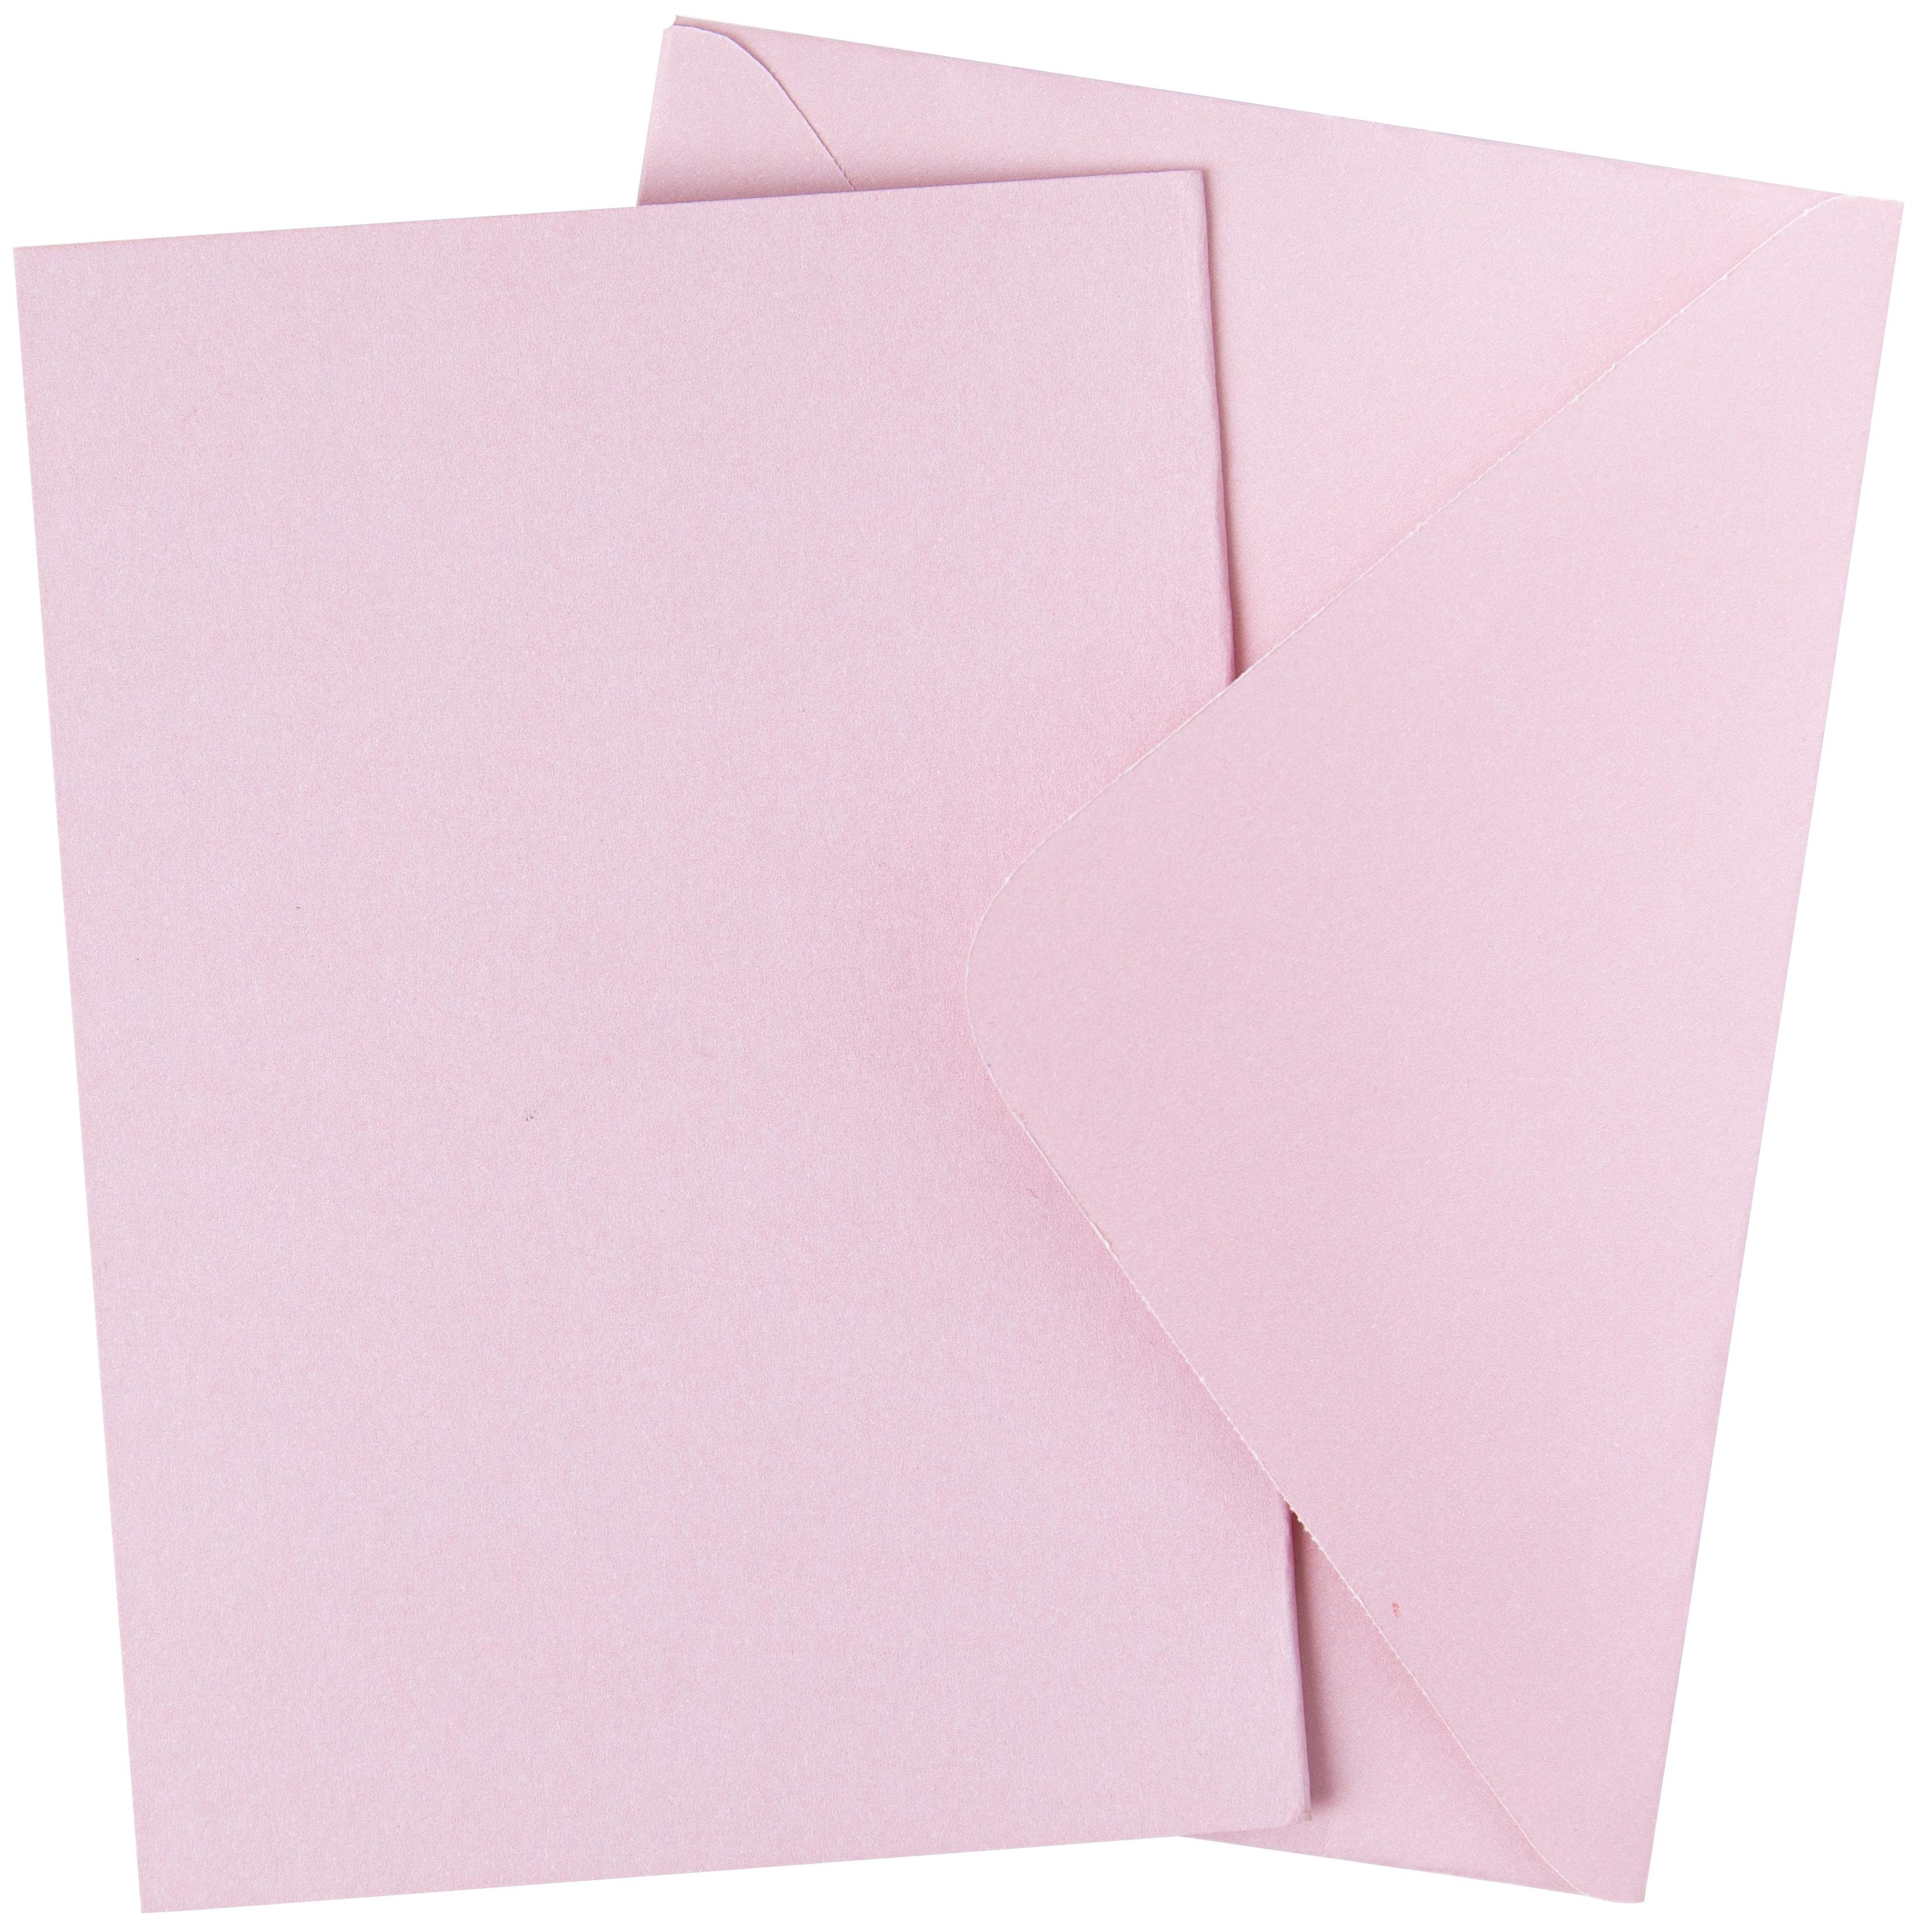 Sizzix Surfacez Card & Envelope Pack A6 10/Pkg-Ballet Slipper